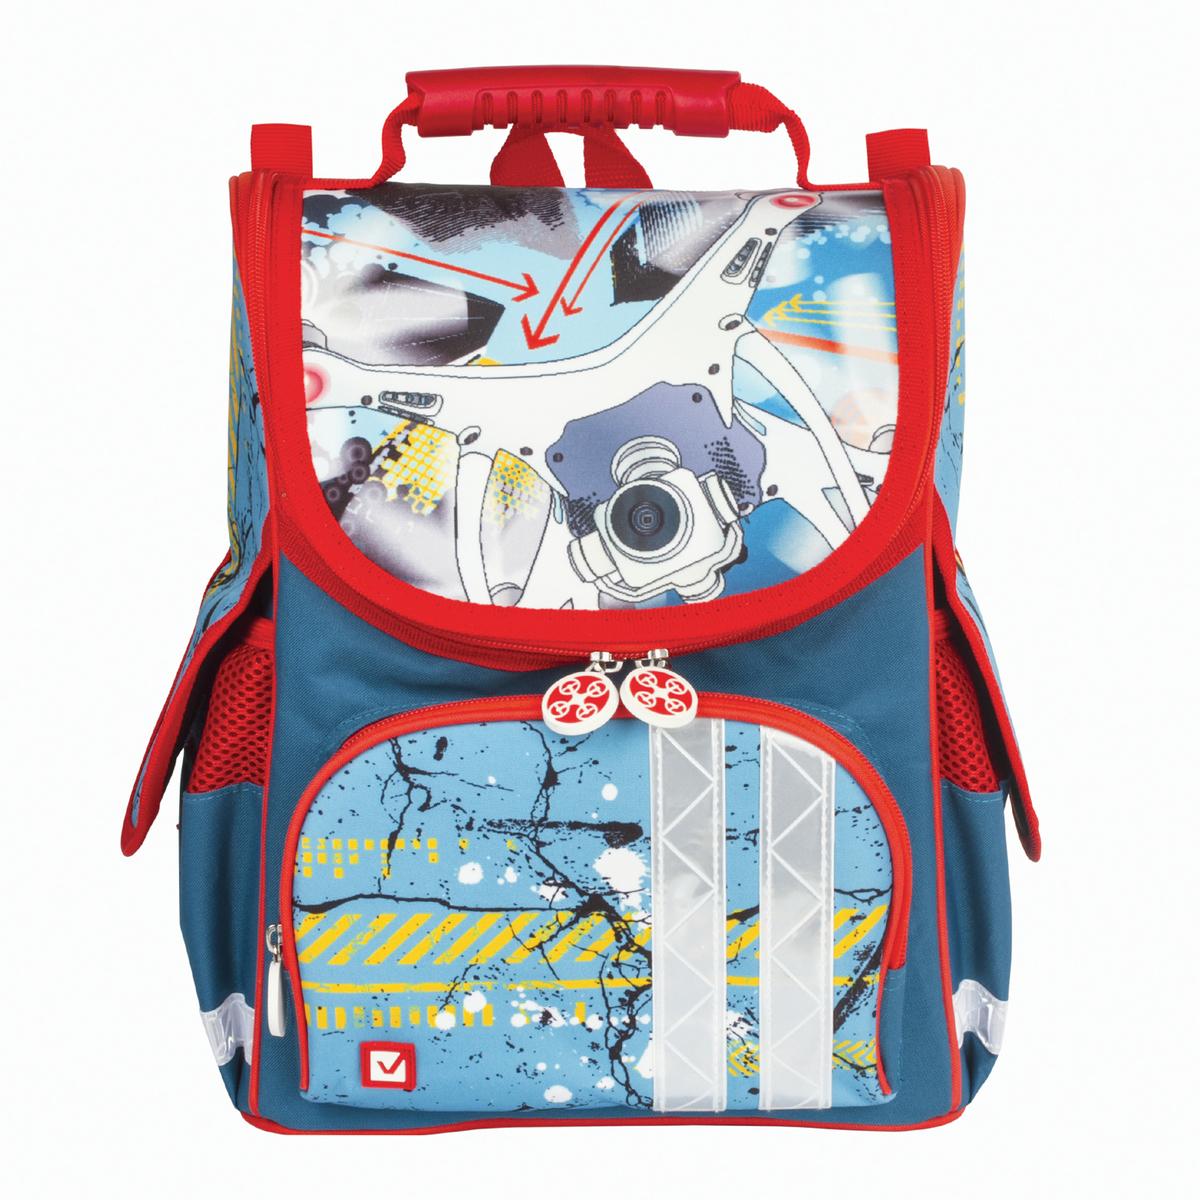 Brauberg Ранец школьный Коптер 226914 школьные рюкзаки brauberg ранец коптер 17 л